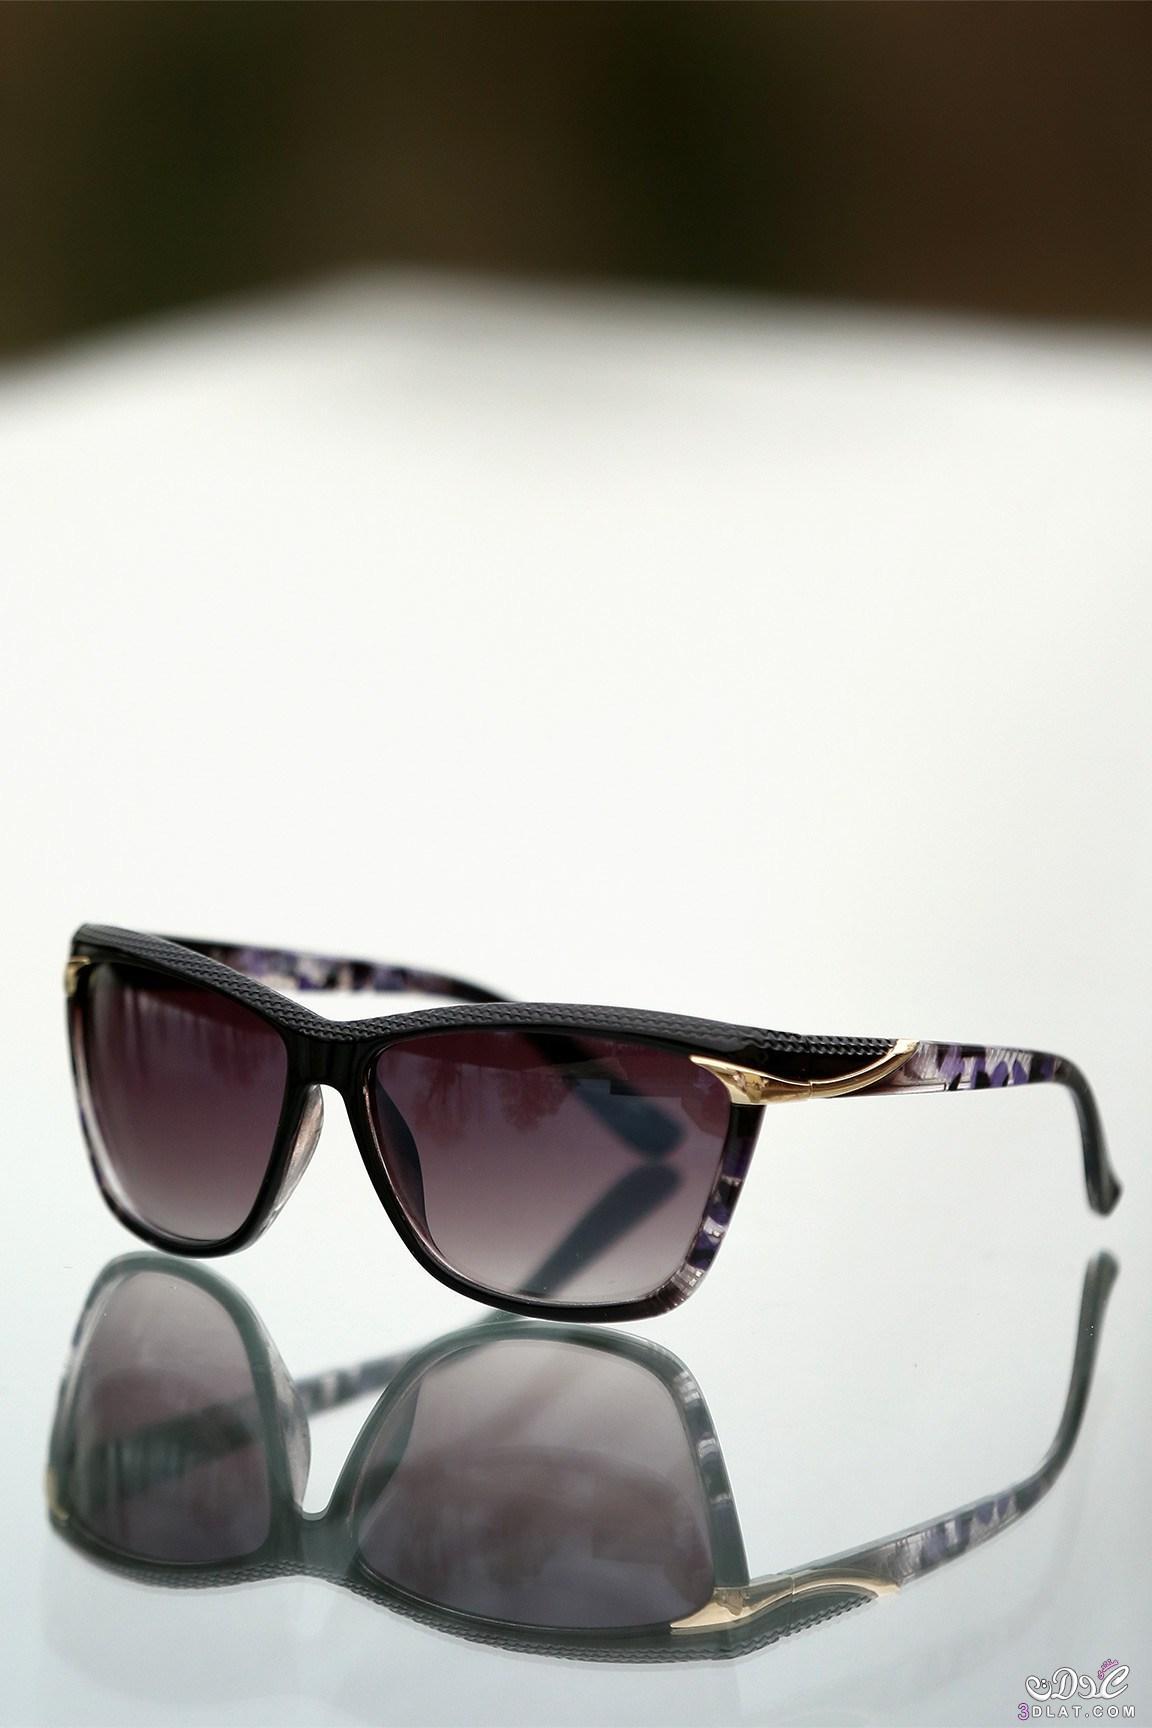 cd4704609 نظارات شمسية حريمي 2020 .... كولكشن نظارات شمسية 2020...نظارات حريمي ...